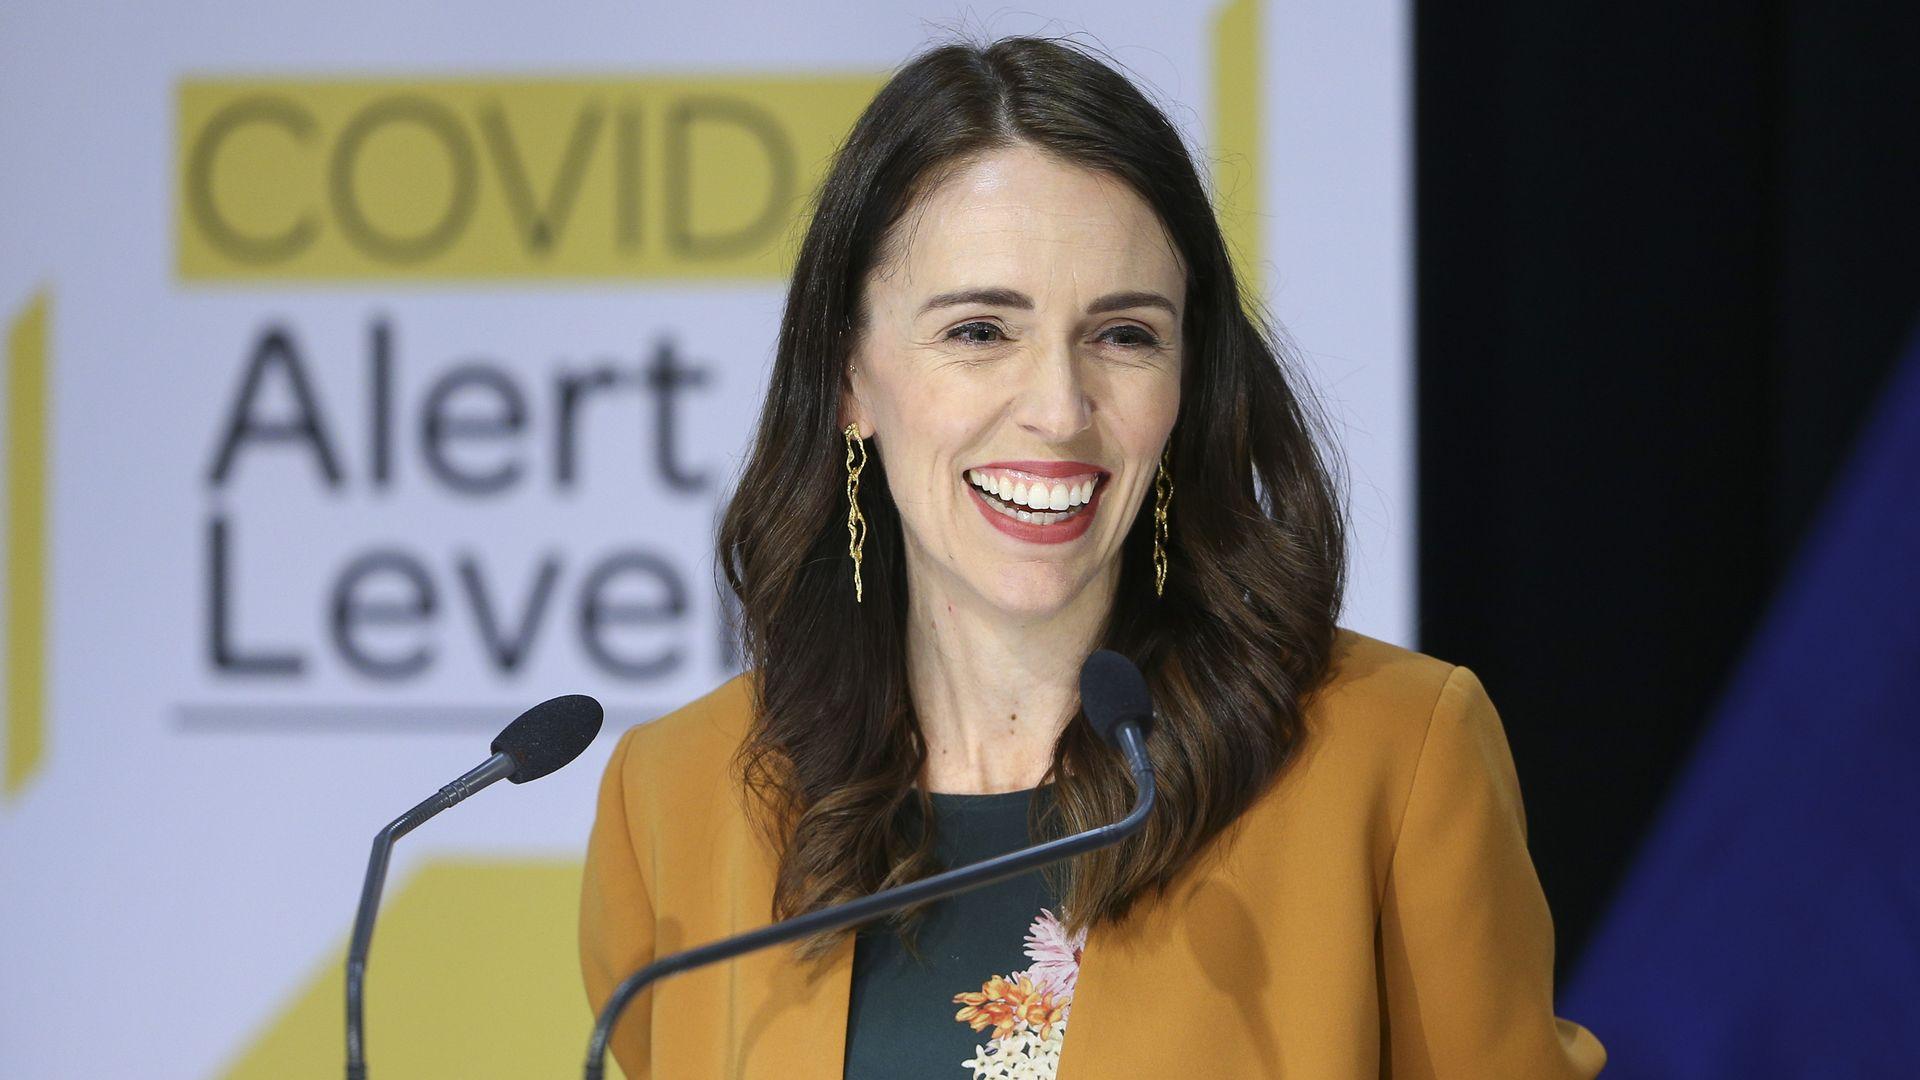 New Zealand has no known coronavirus cases